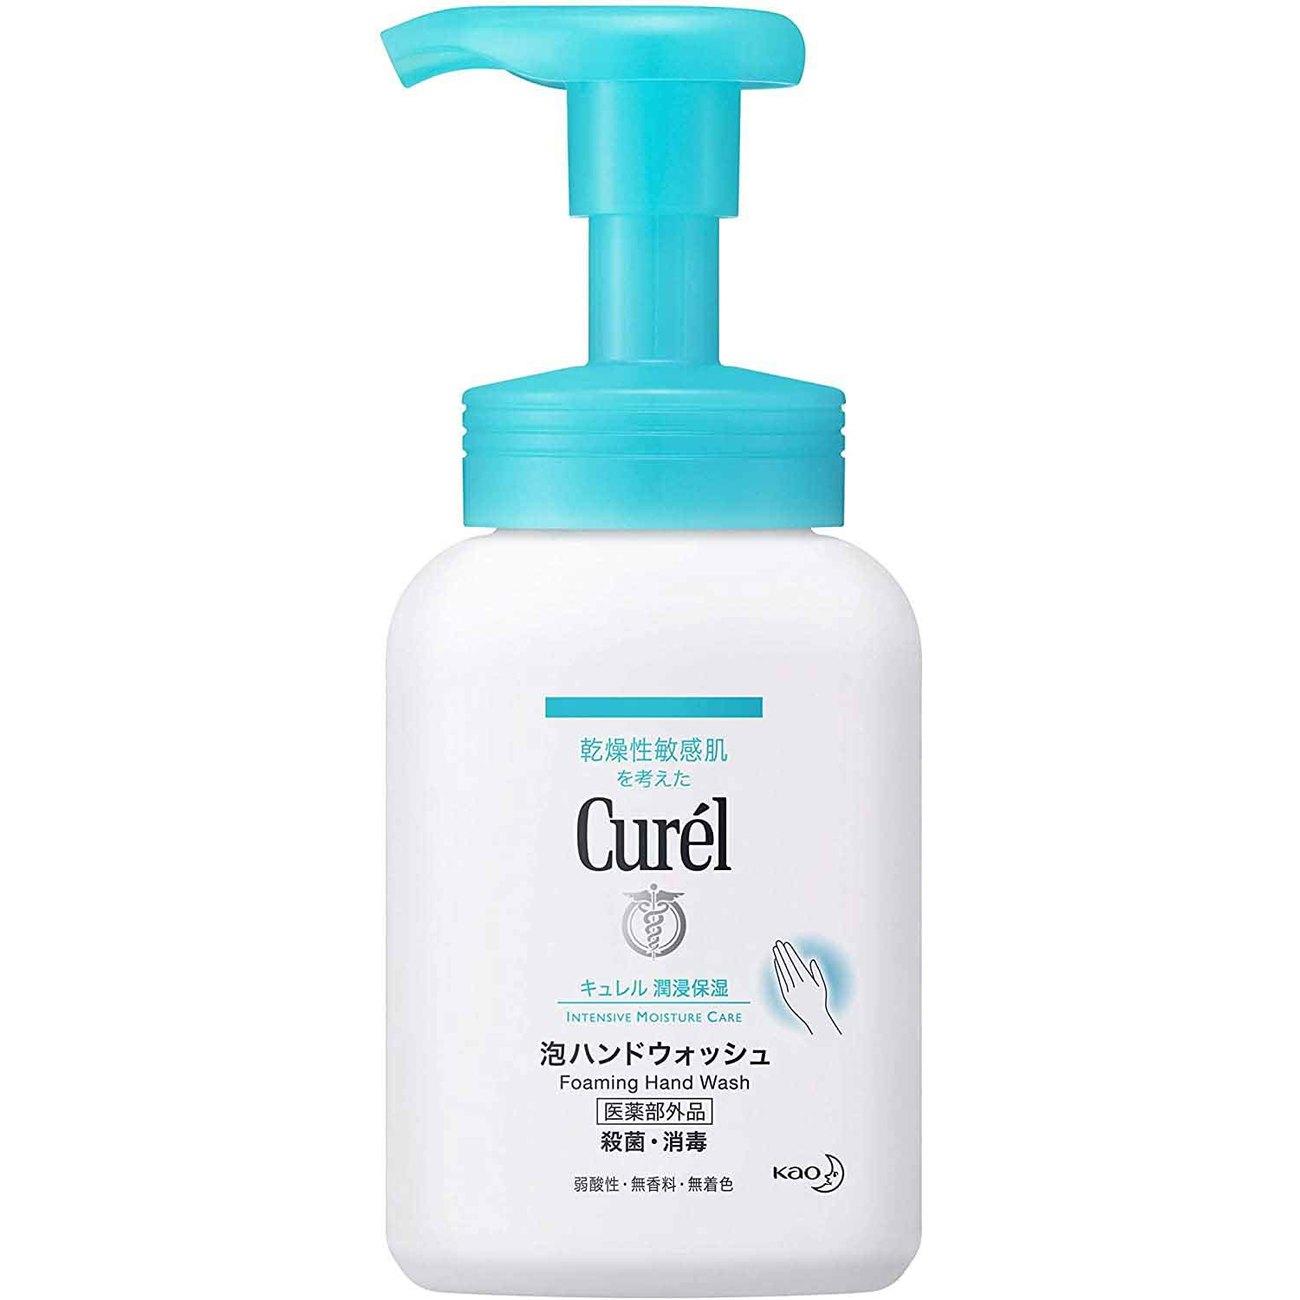 Curel(キュレル) 泡ハンドウォッシュ